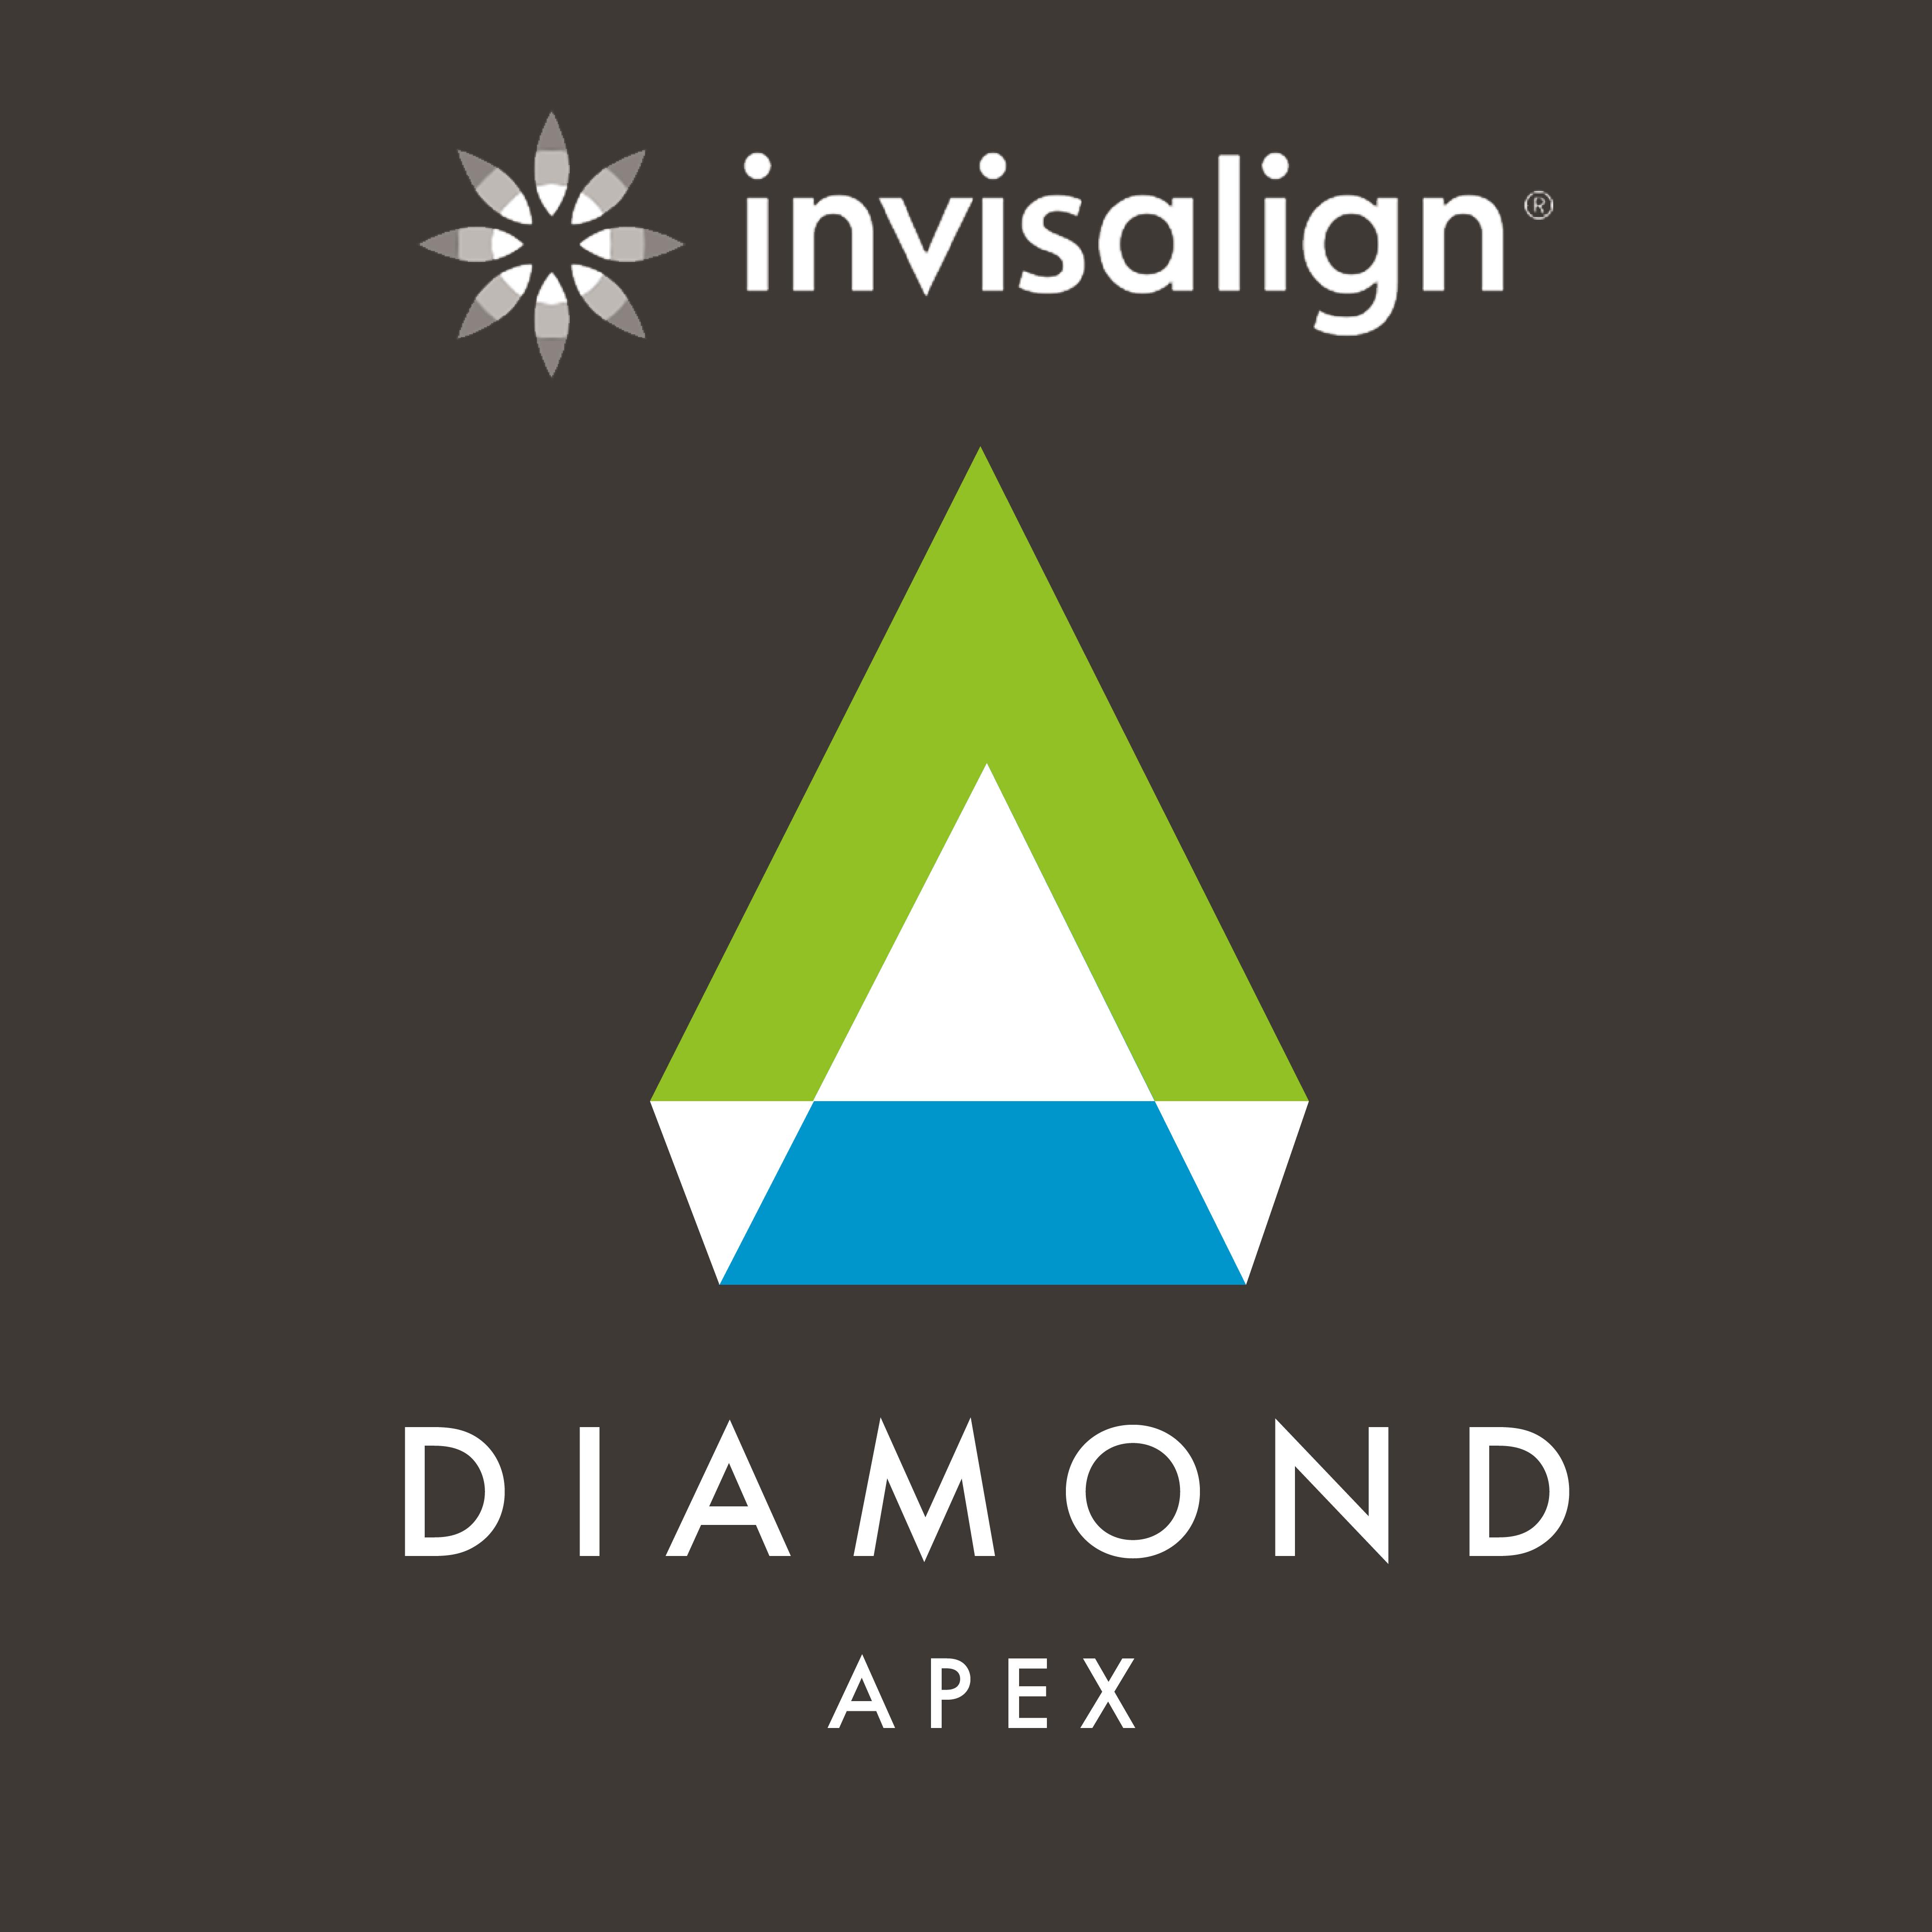 Invisalign Diamond Apex